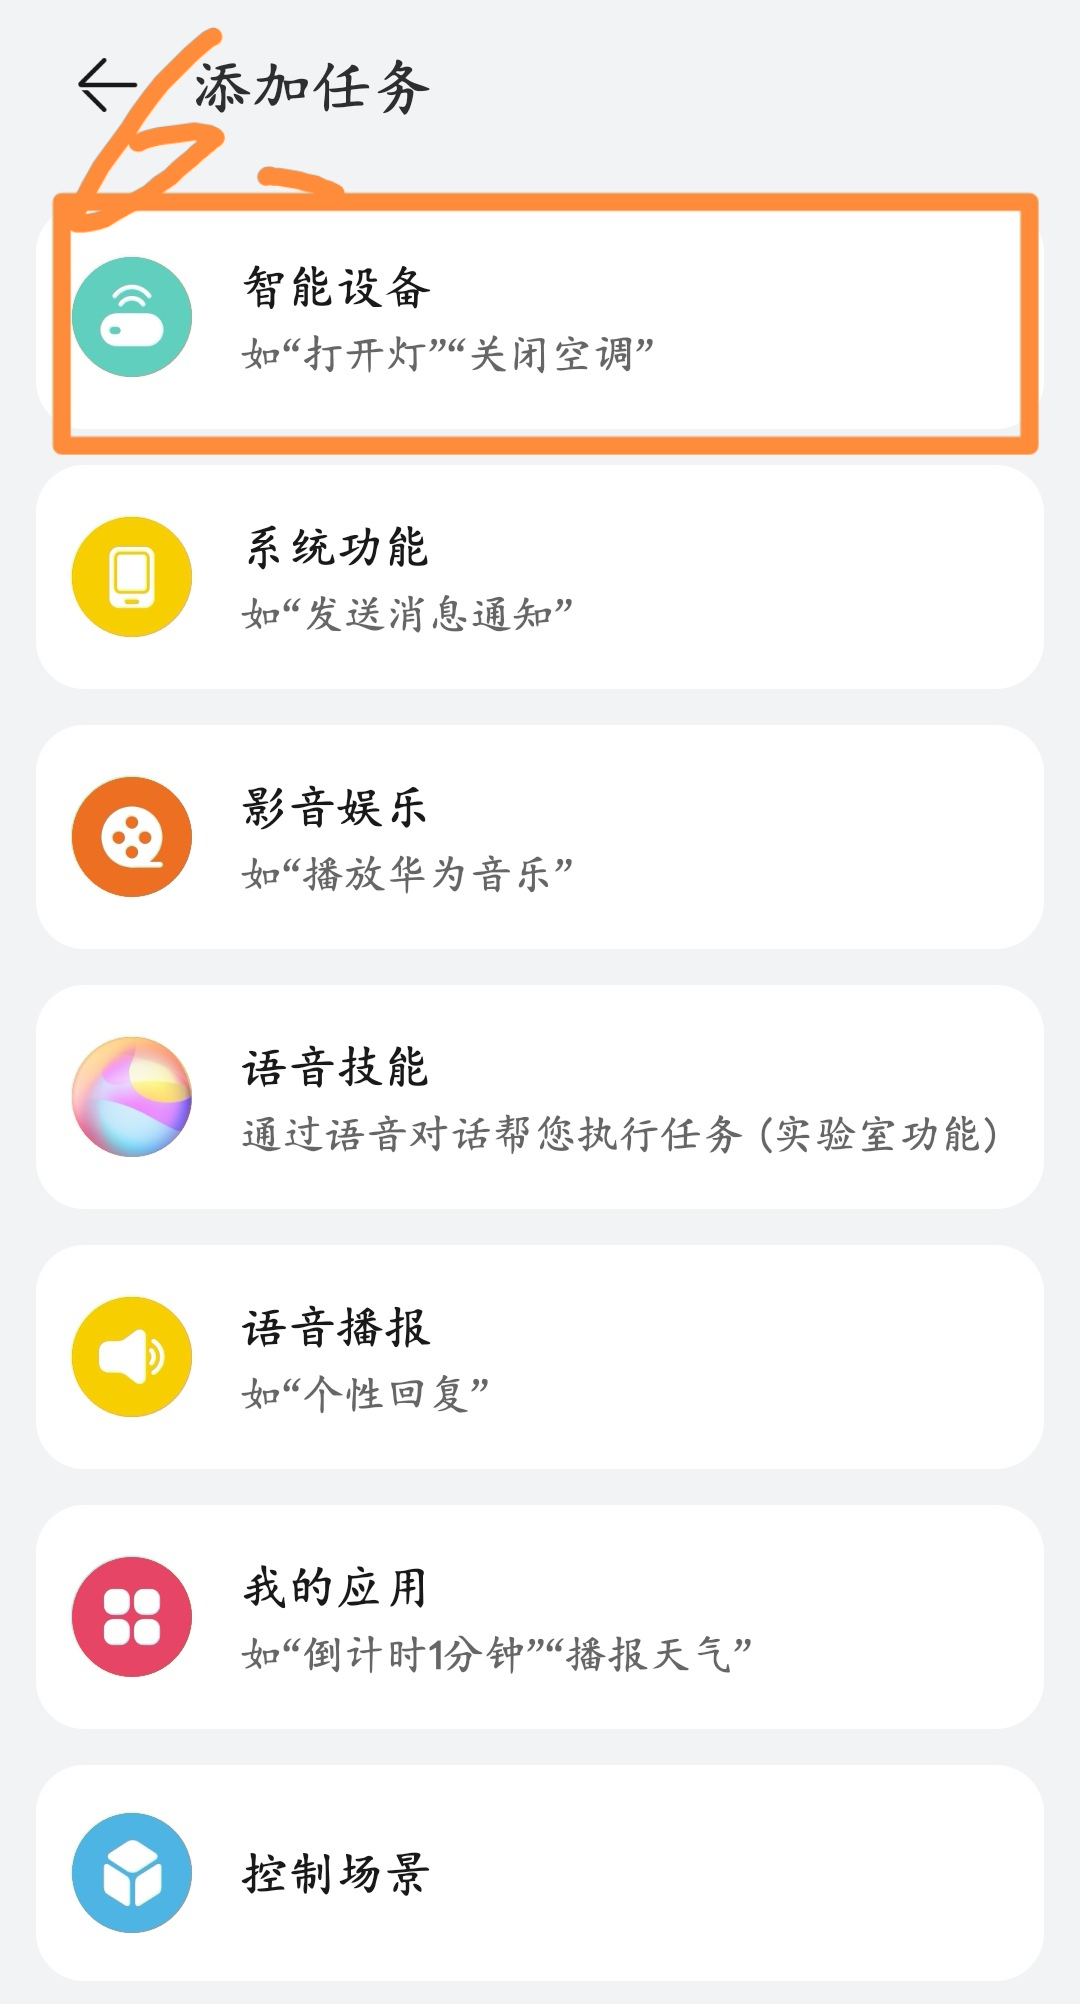 Screenshot_20210913_141539_com.huawei.smarthome_edit_1247394637533614.jpg